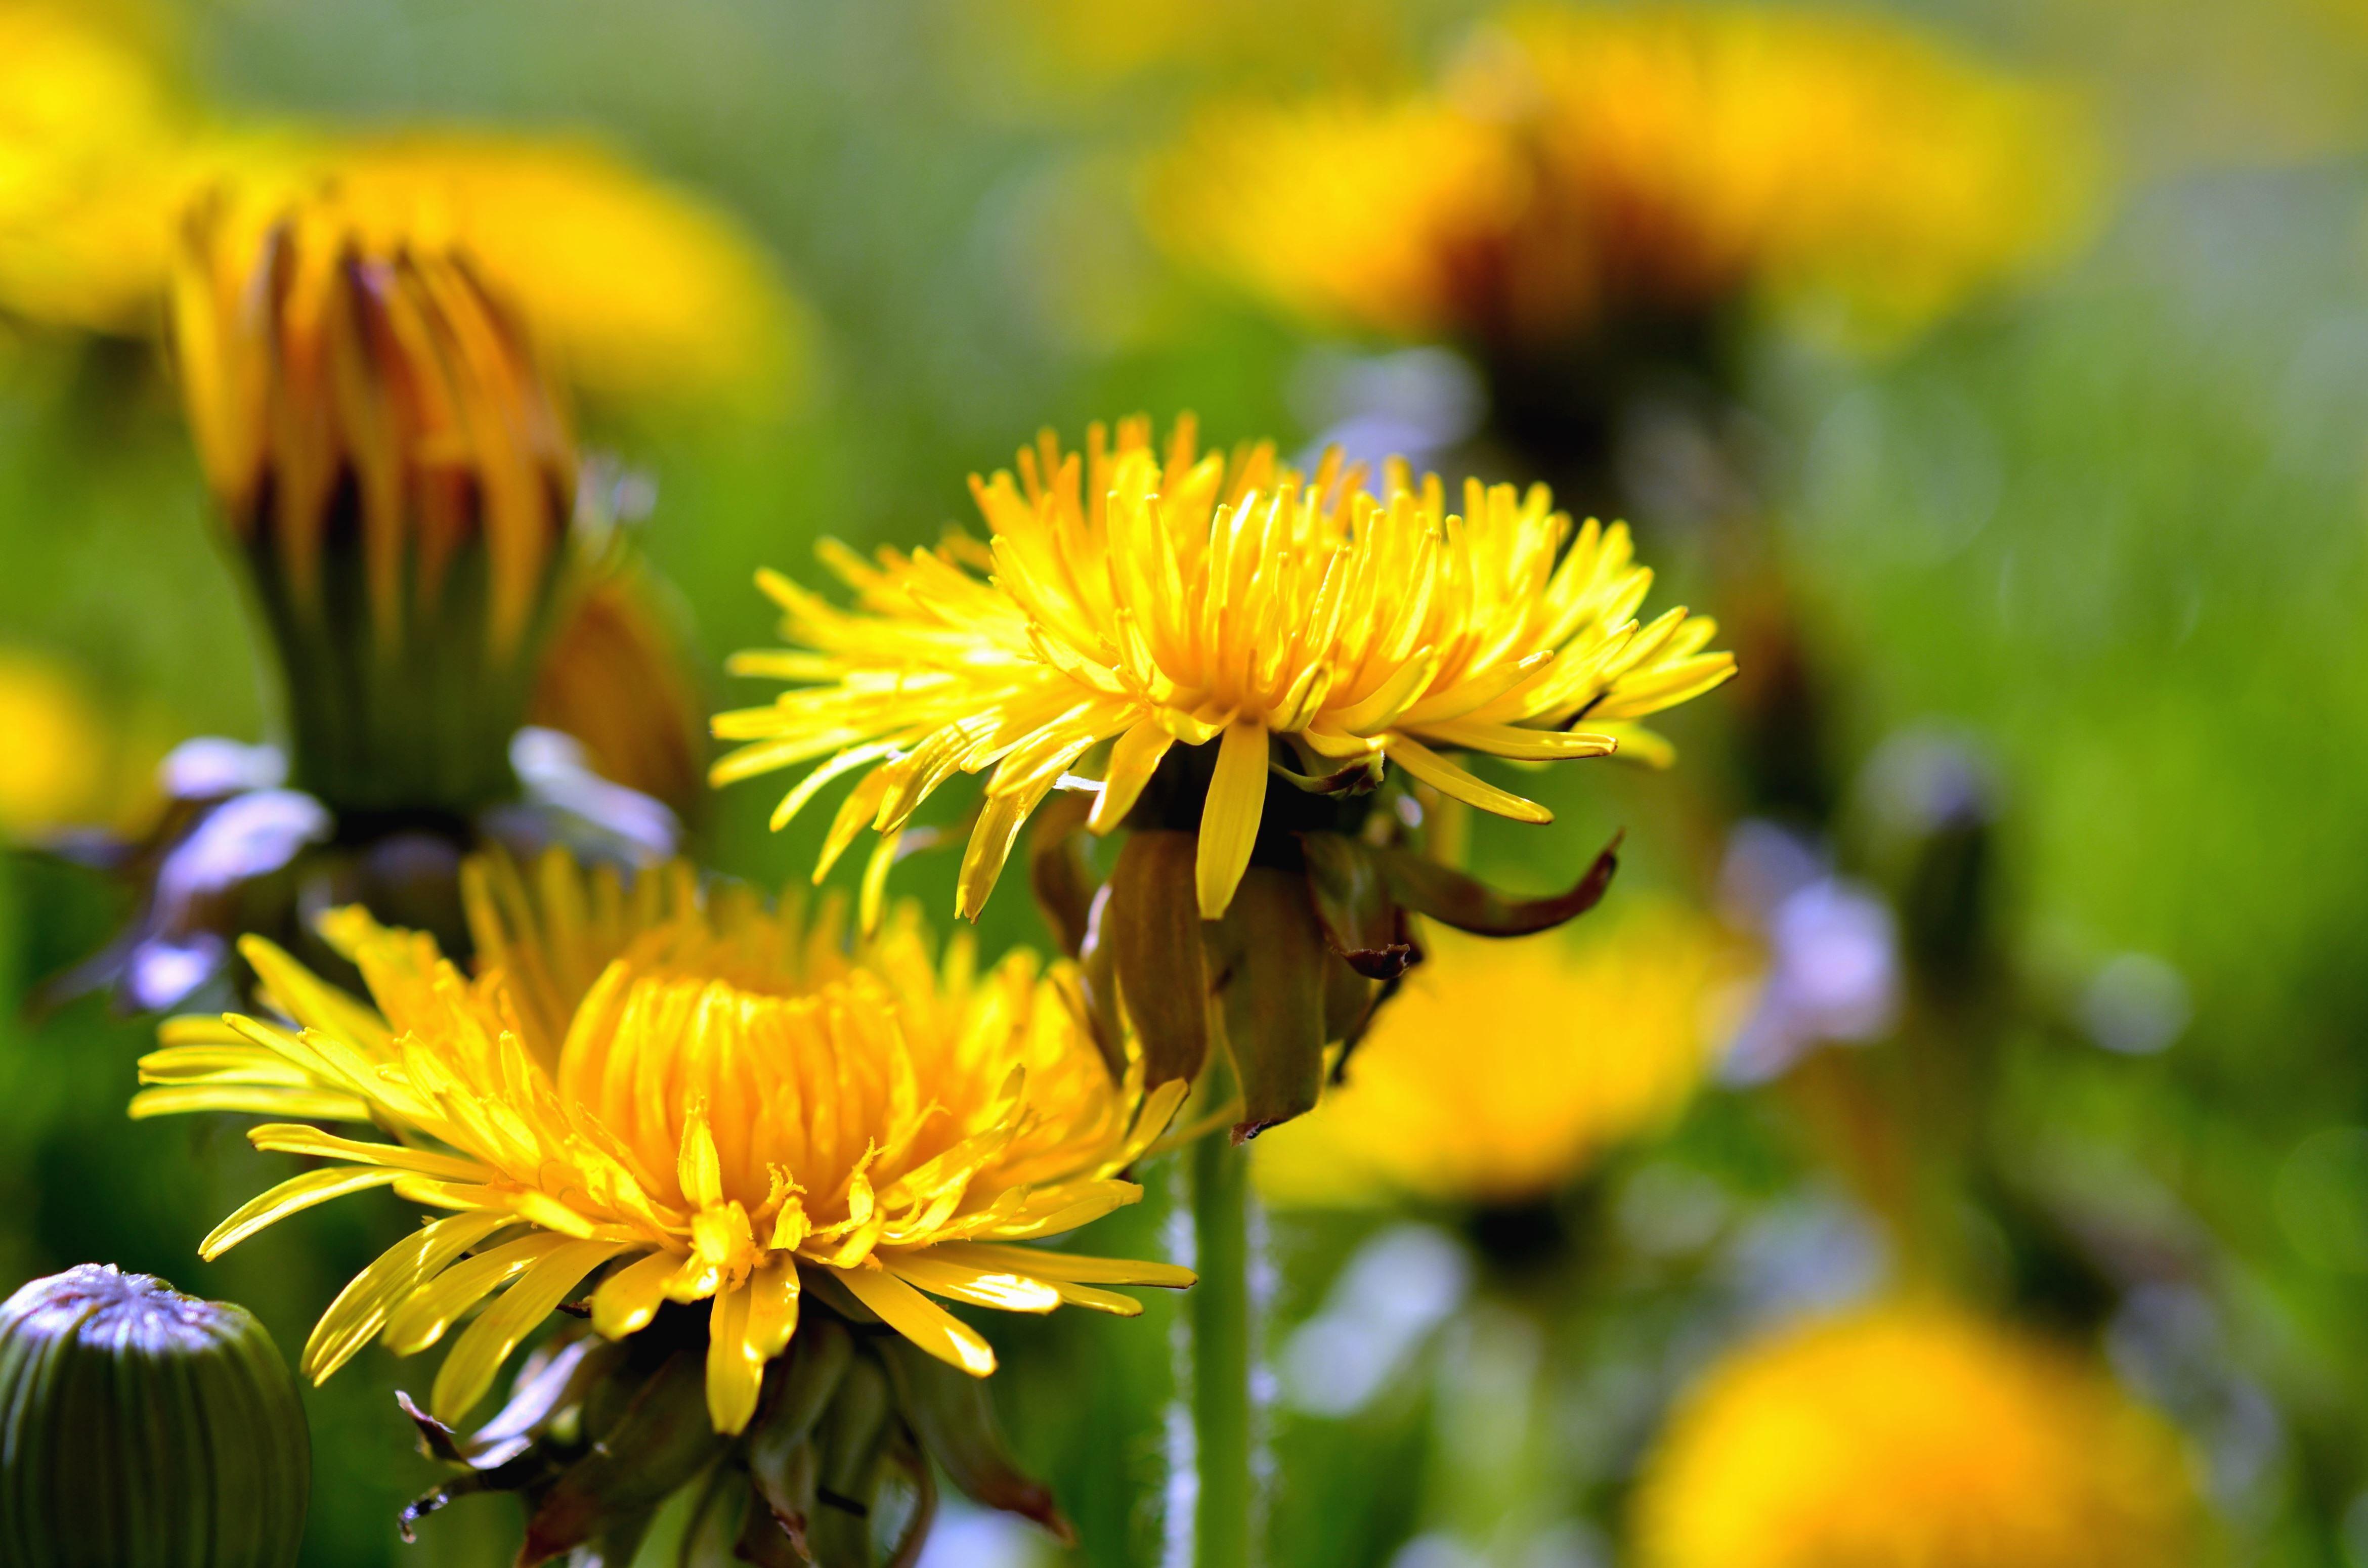 free picture: dandelion, flower, flowering, haulm, petals, nature